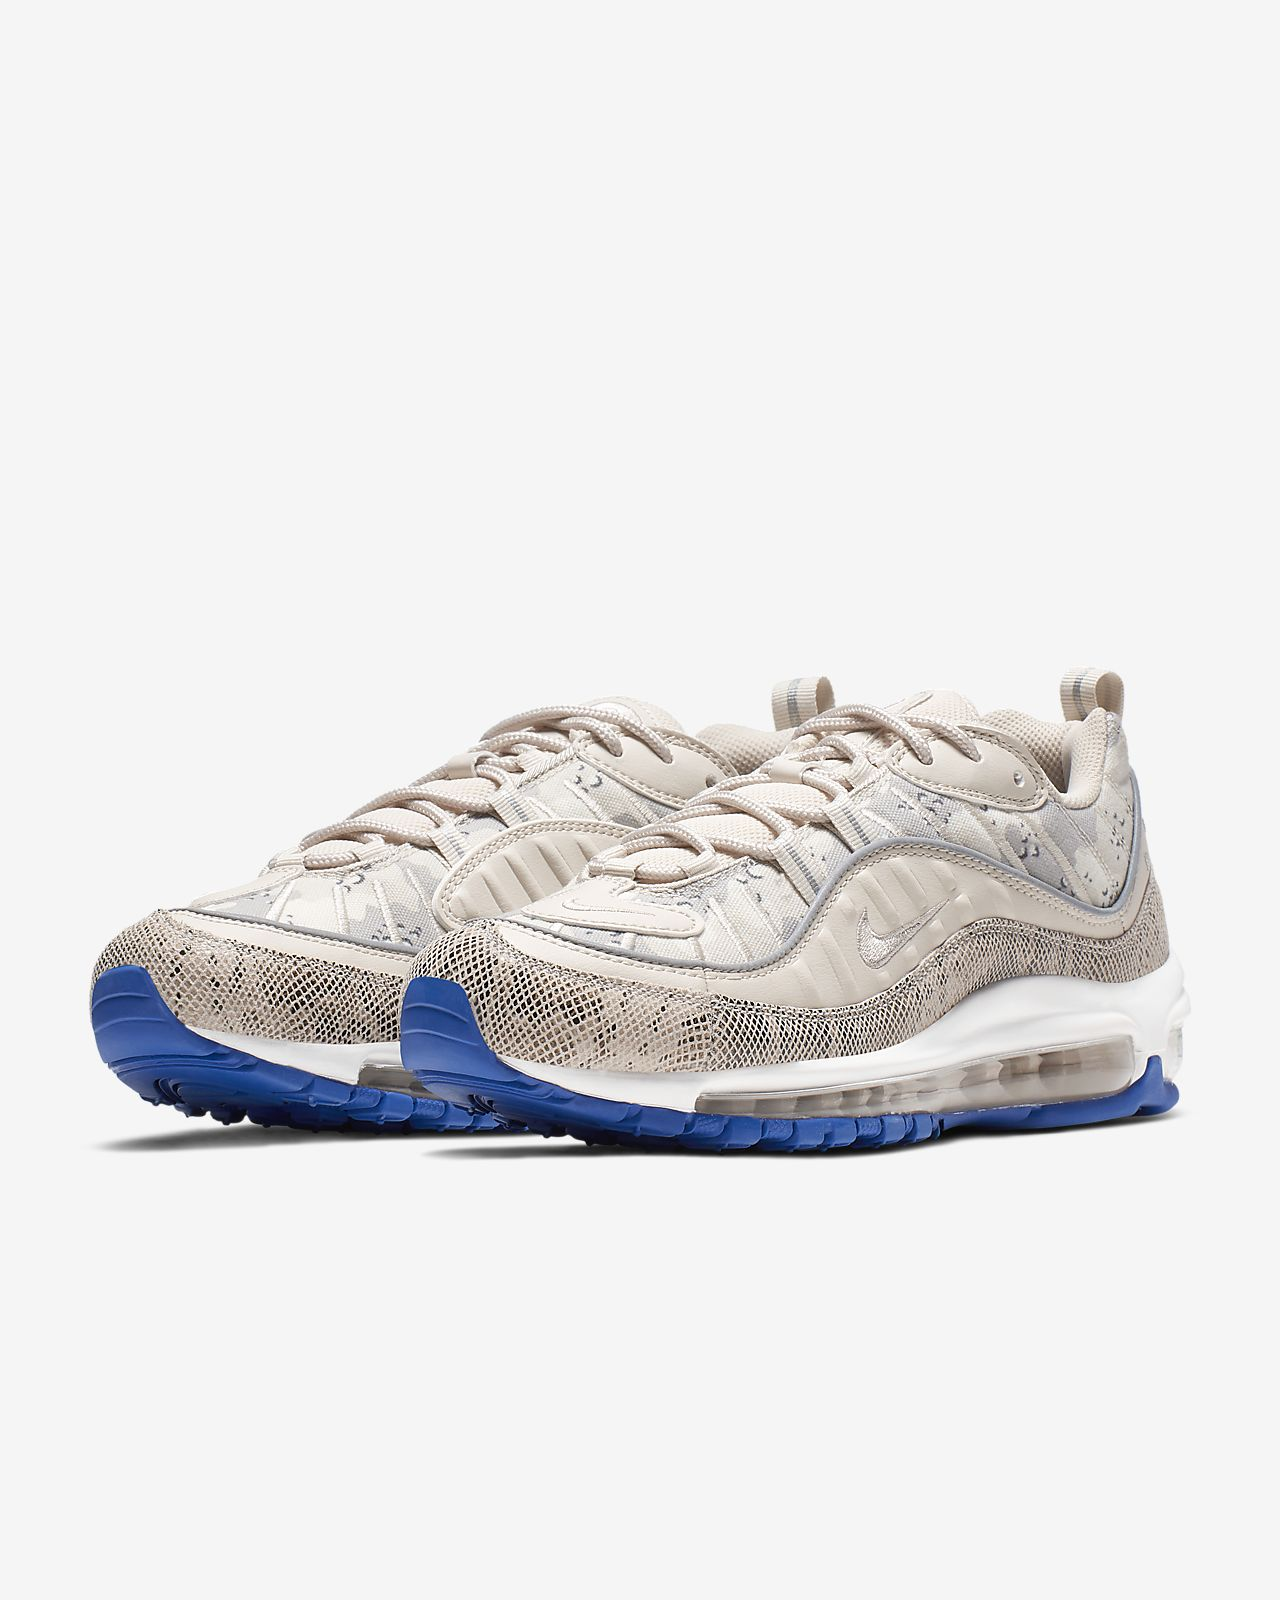 Chaussures Nike Wmns Air Max 98 Beige Beige Achat Vente